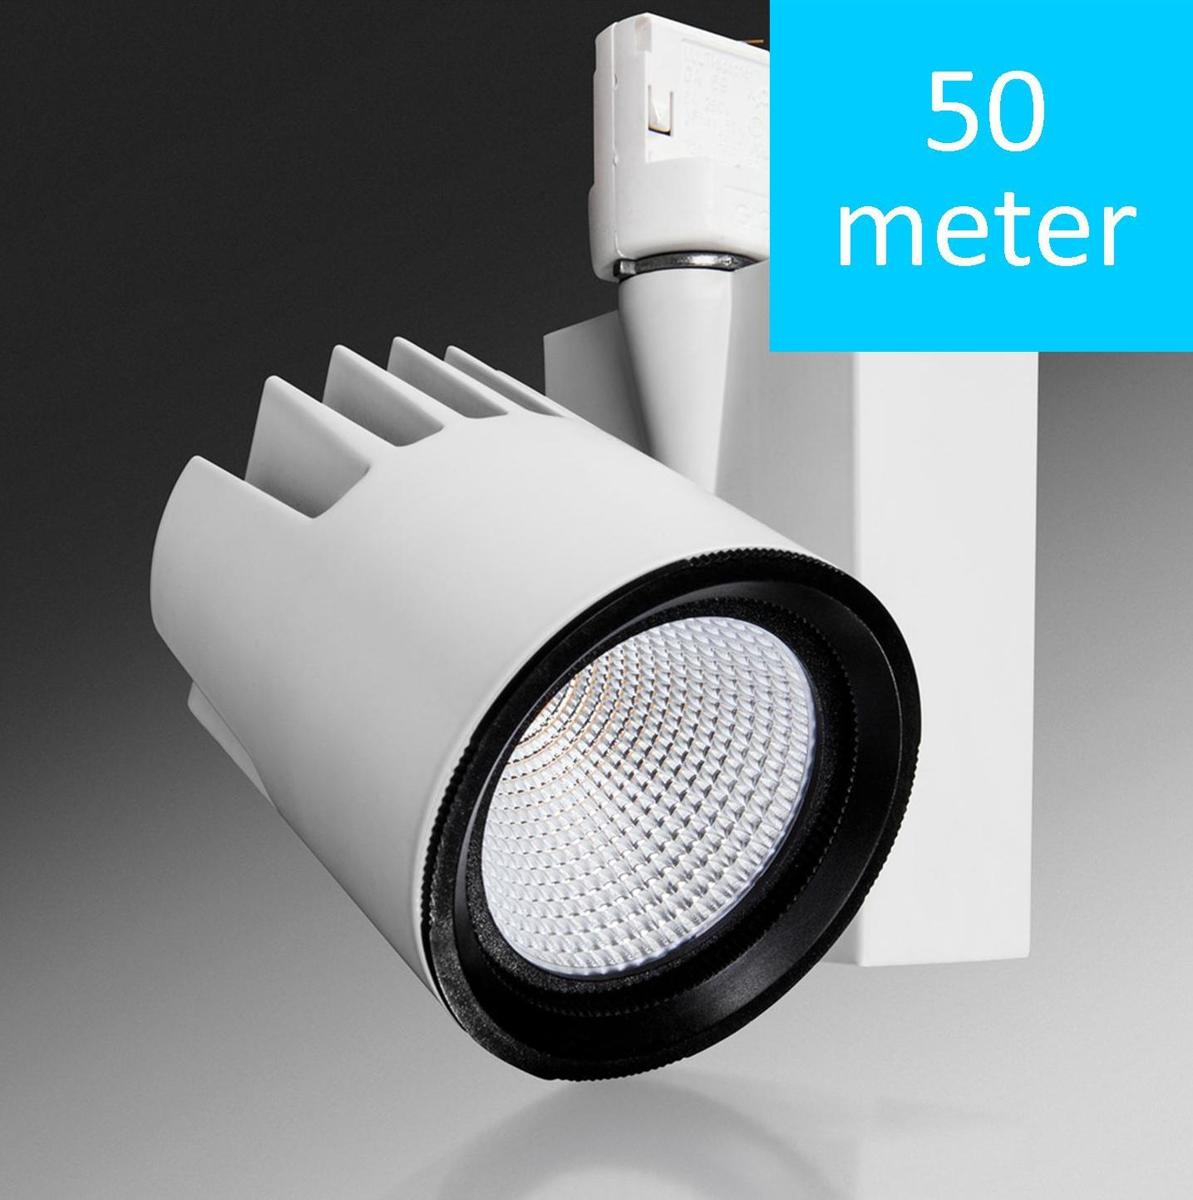 Verbatim Mitsubishi 52470 50Stuks=50Meter LED 3 Fase Spanningsrail  Tracklight 24W 3000K 2400lm 45D White kopen